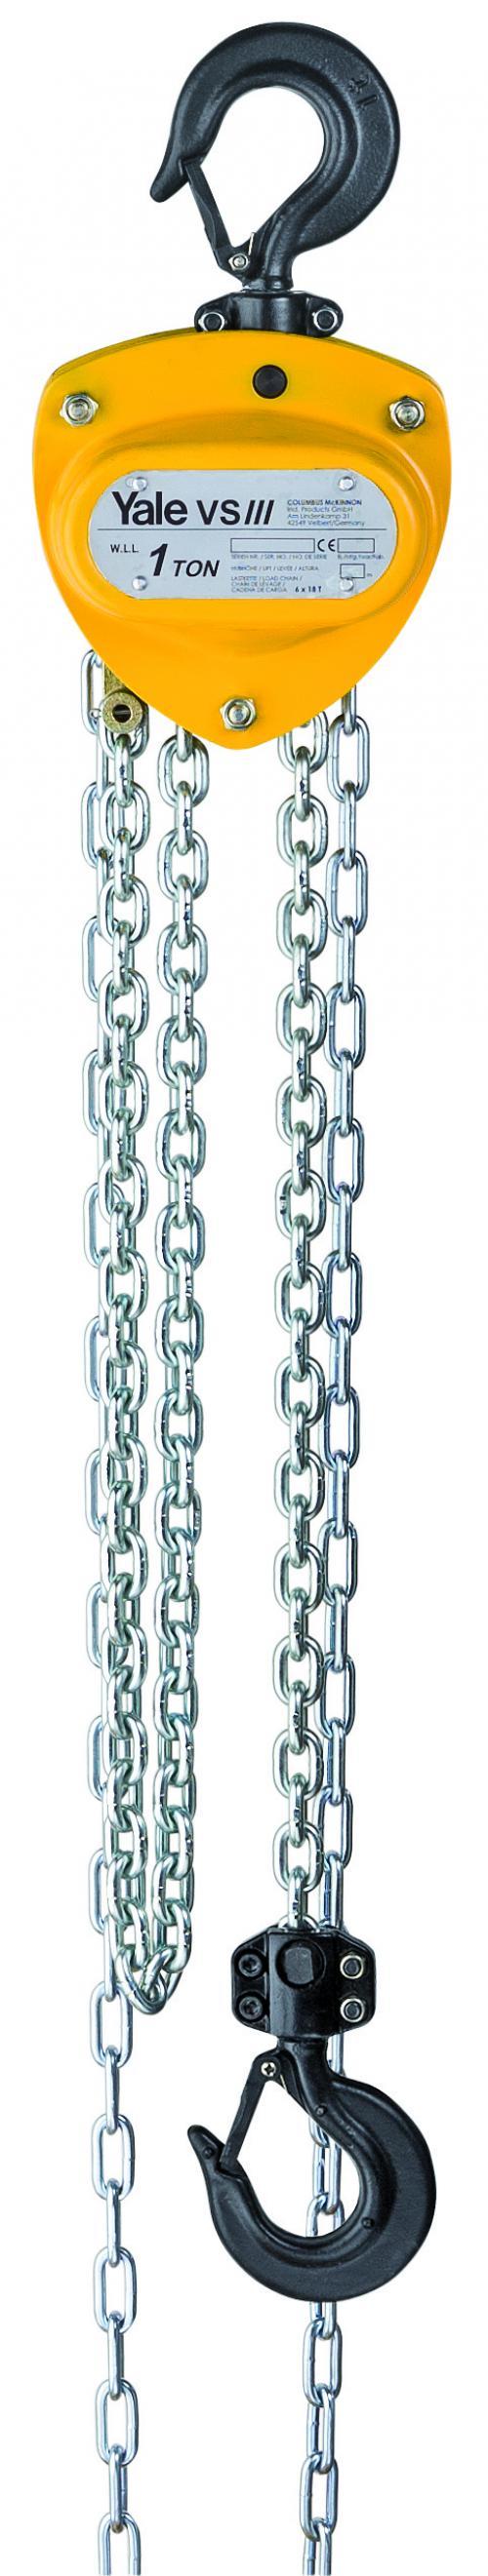 Yale Vsiii Chain Hoist Hoists Trolleys Blocks 3 Ton Wiring Diagram For Electric 112 Views Today